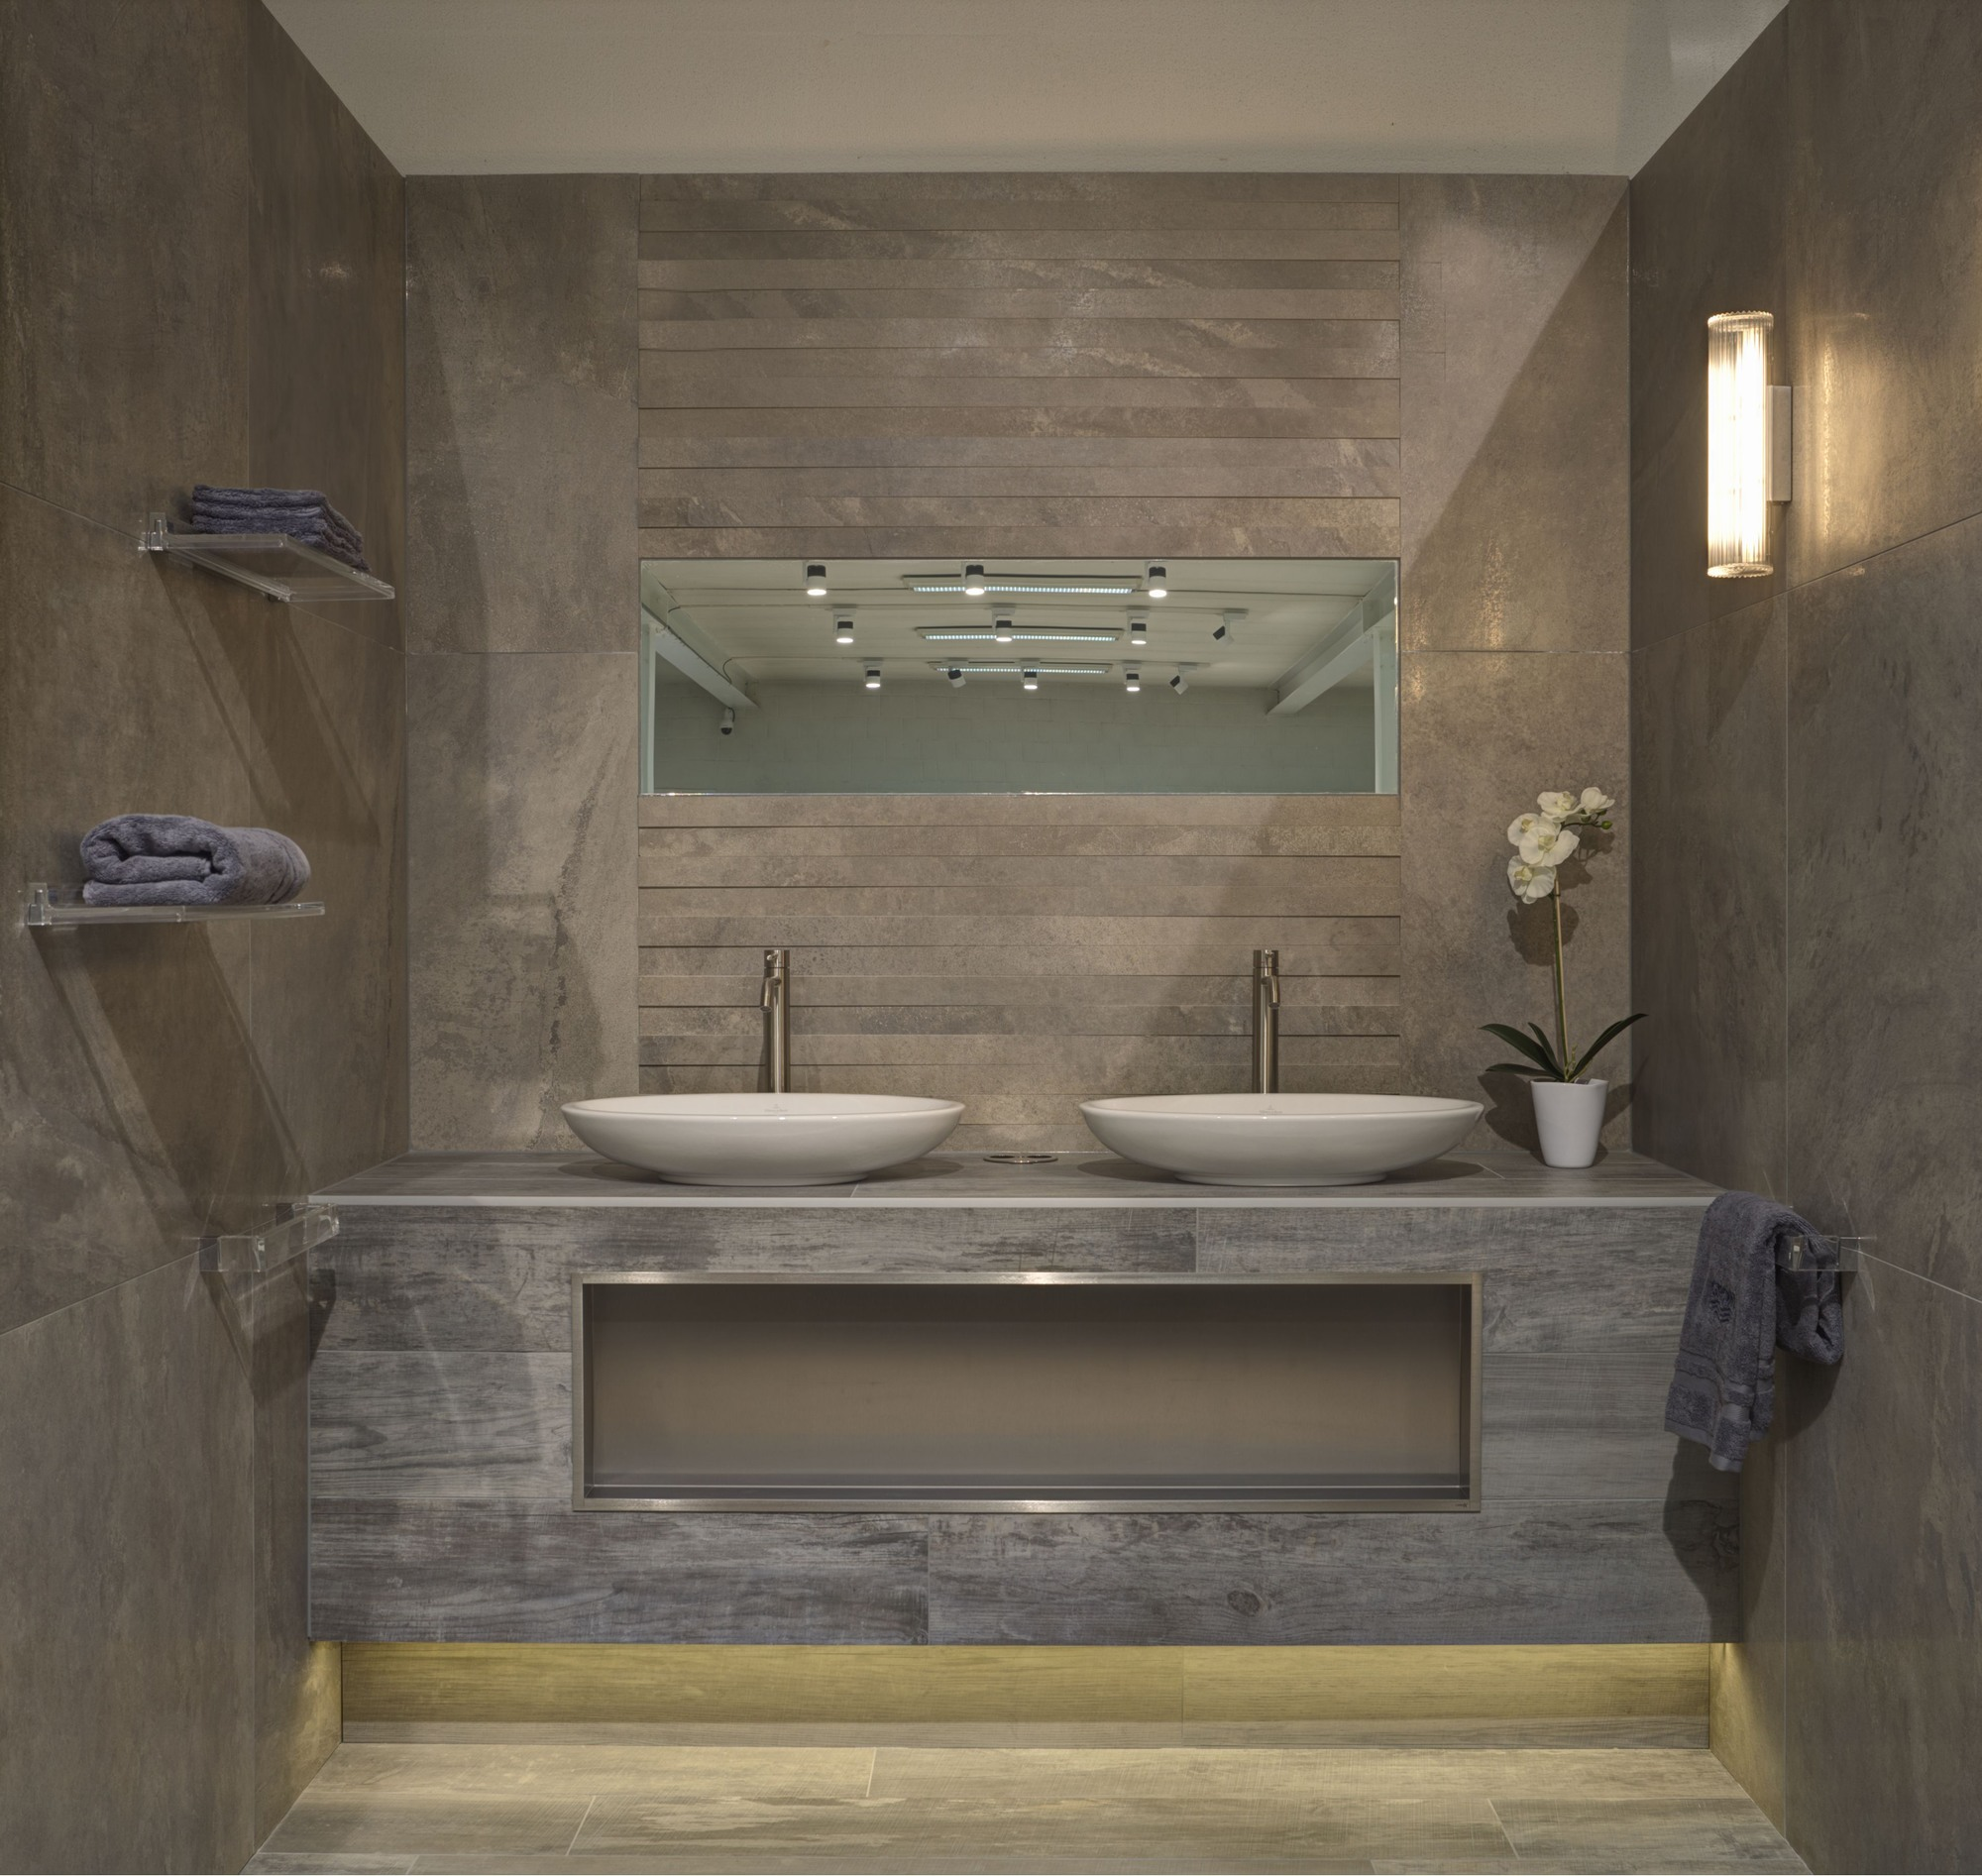 De Tichelaar Maasmechelen | Tegels, sanitair, badkamers, verwarming ...